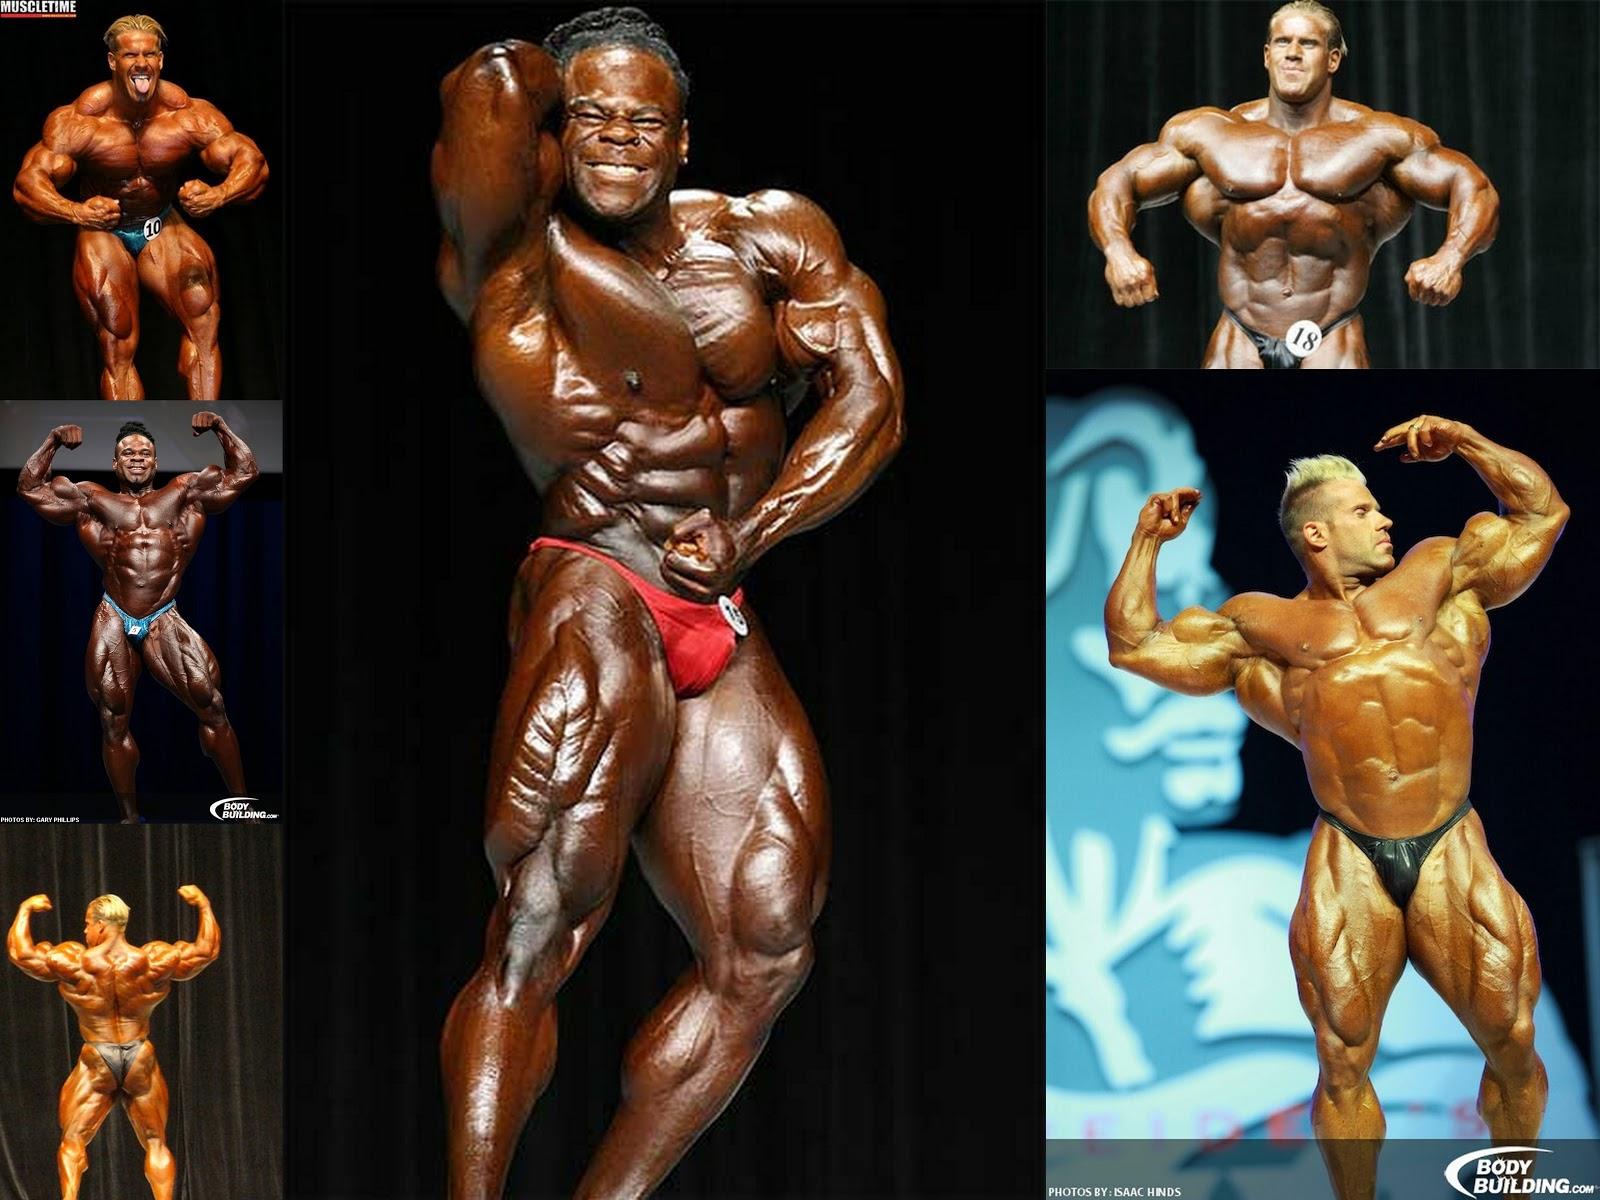 http://1.bp.blogspot.com/_iBQo77PwEww/TFMD-OBvyAI/AAAAAAAAIs8/63dpYDOFMOI/s1600/kai_greene_vs_jay_cutler_bodybuilders_mister_olympia_2010.jpg